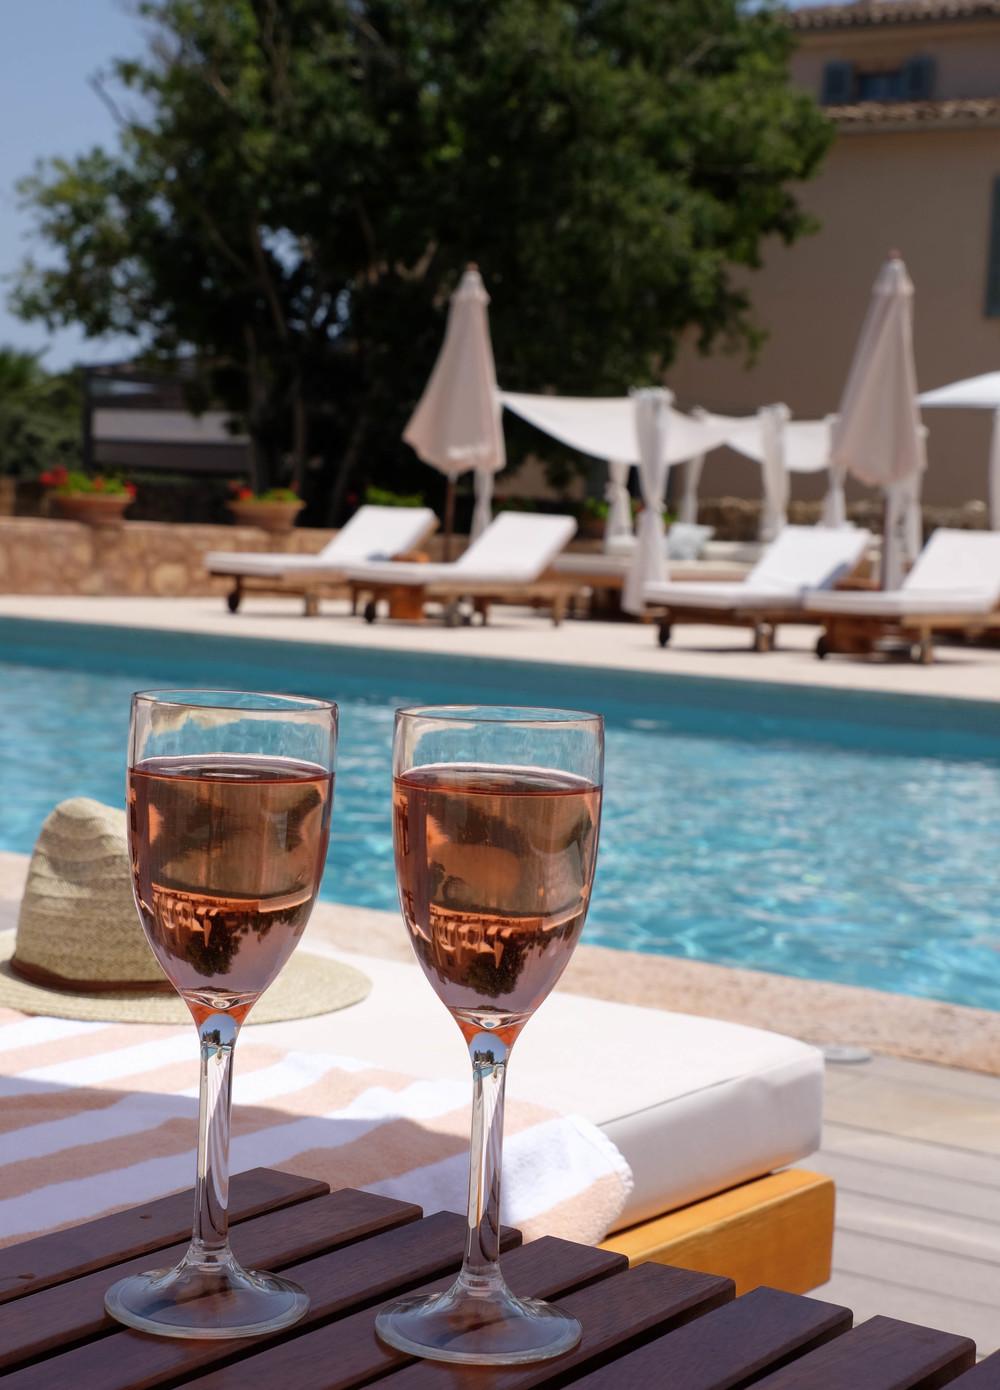 LaurenSchwaiger-Life-Style-Travel-Blog-Predi-Son-Jaumell-Mallorca-Spain.jpg